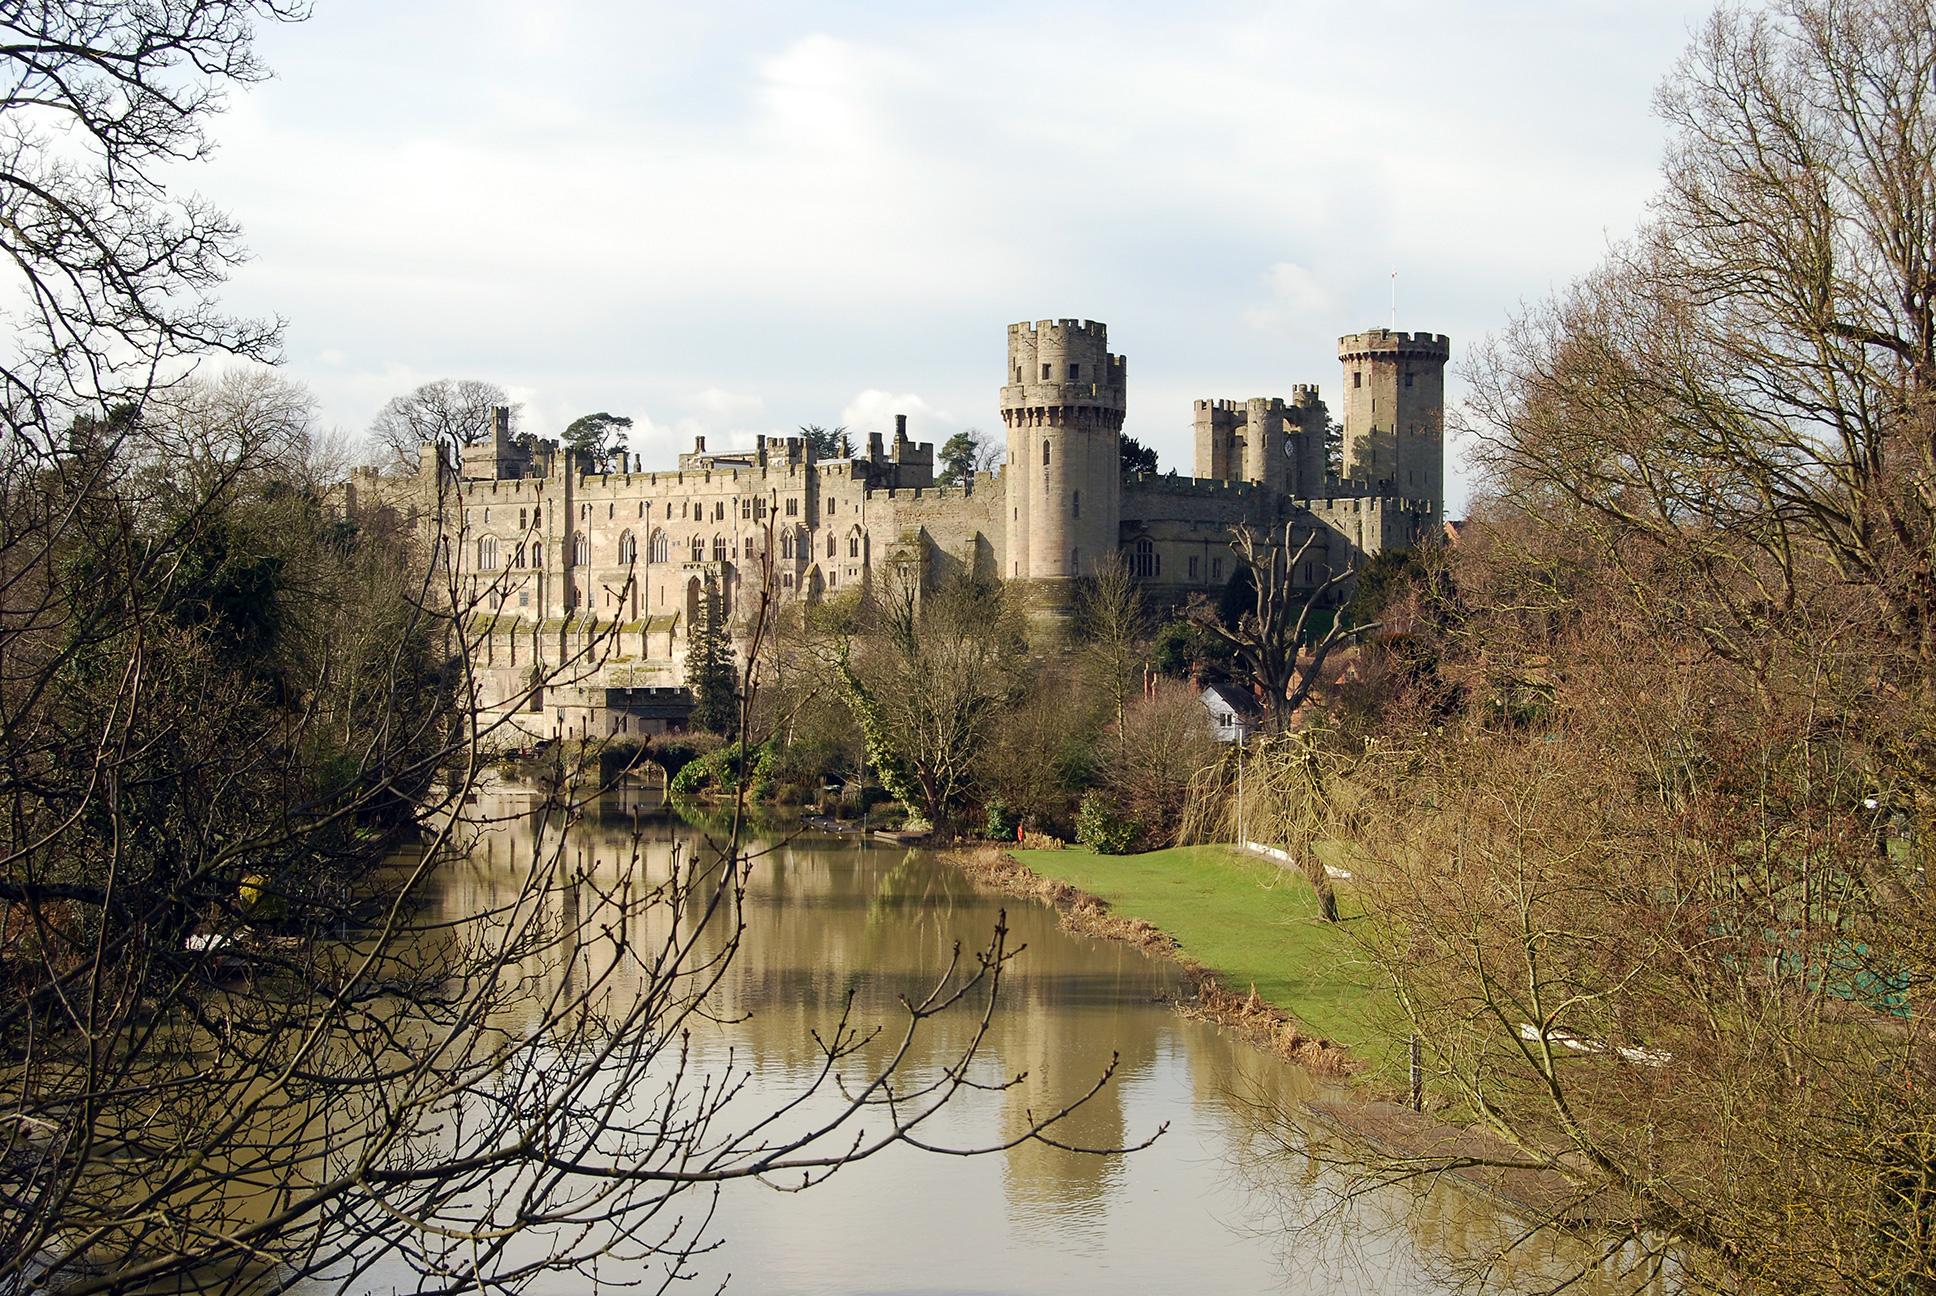 Great Castles - Ghost Tower of Warwick Castle